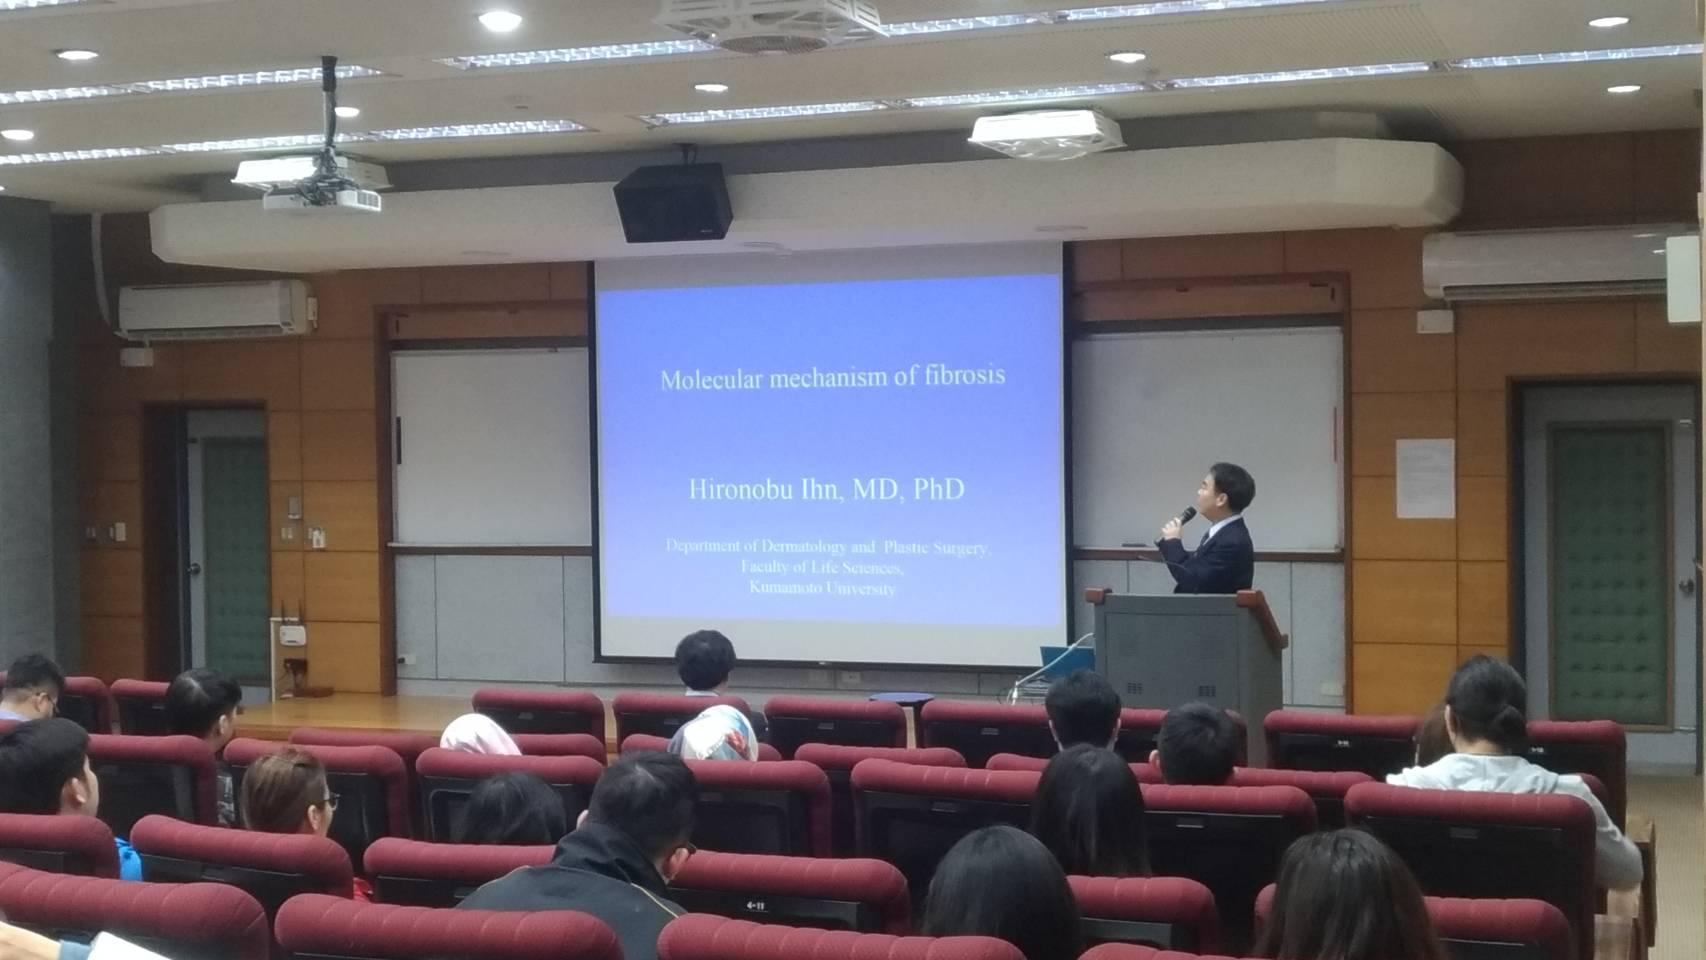 2019/03/26  Prof. Hironobu Ihn 演講照片